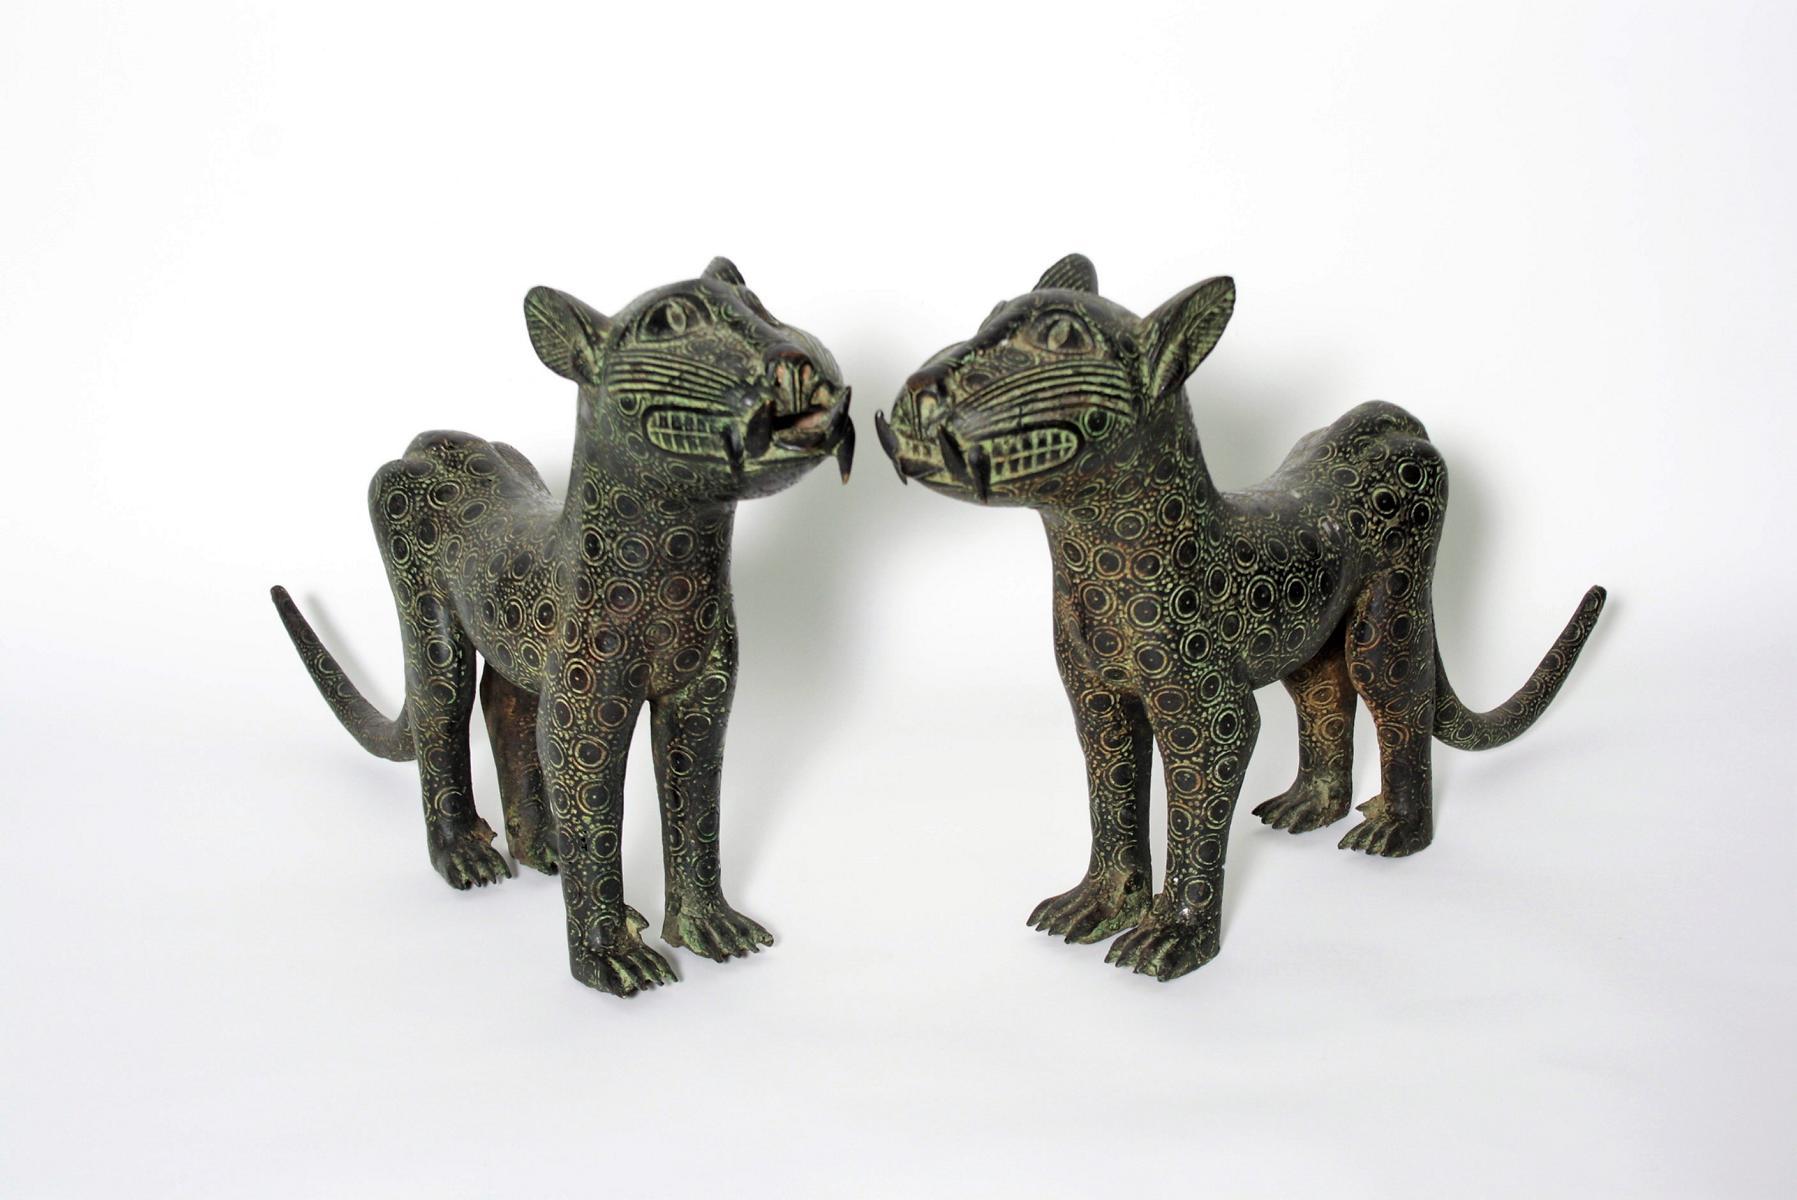 Leoparden Paar, Benin, Nigeria, 1. Hälfte 20. Jh.